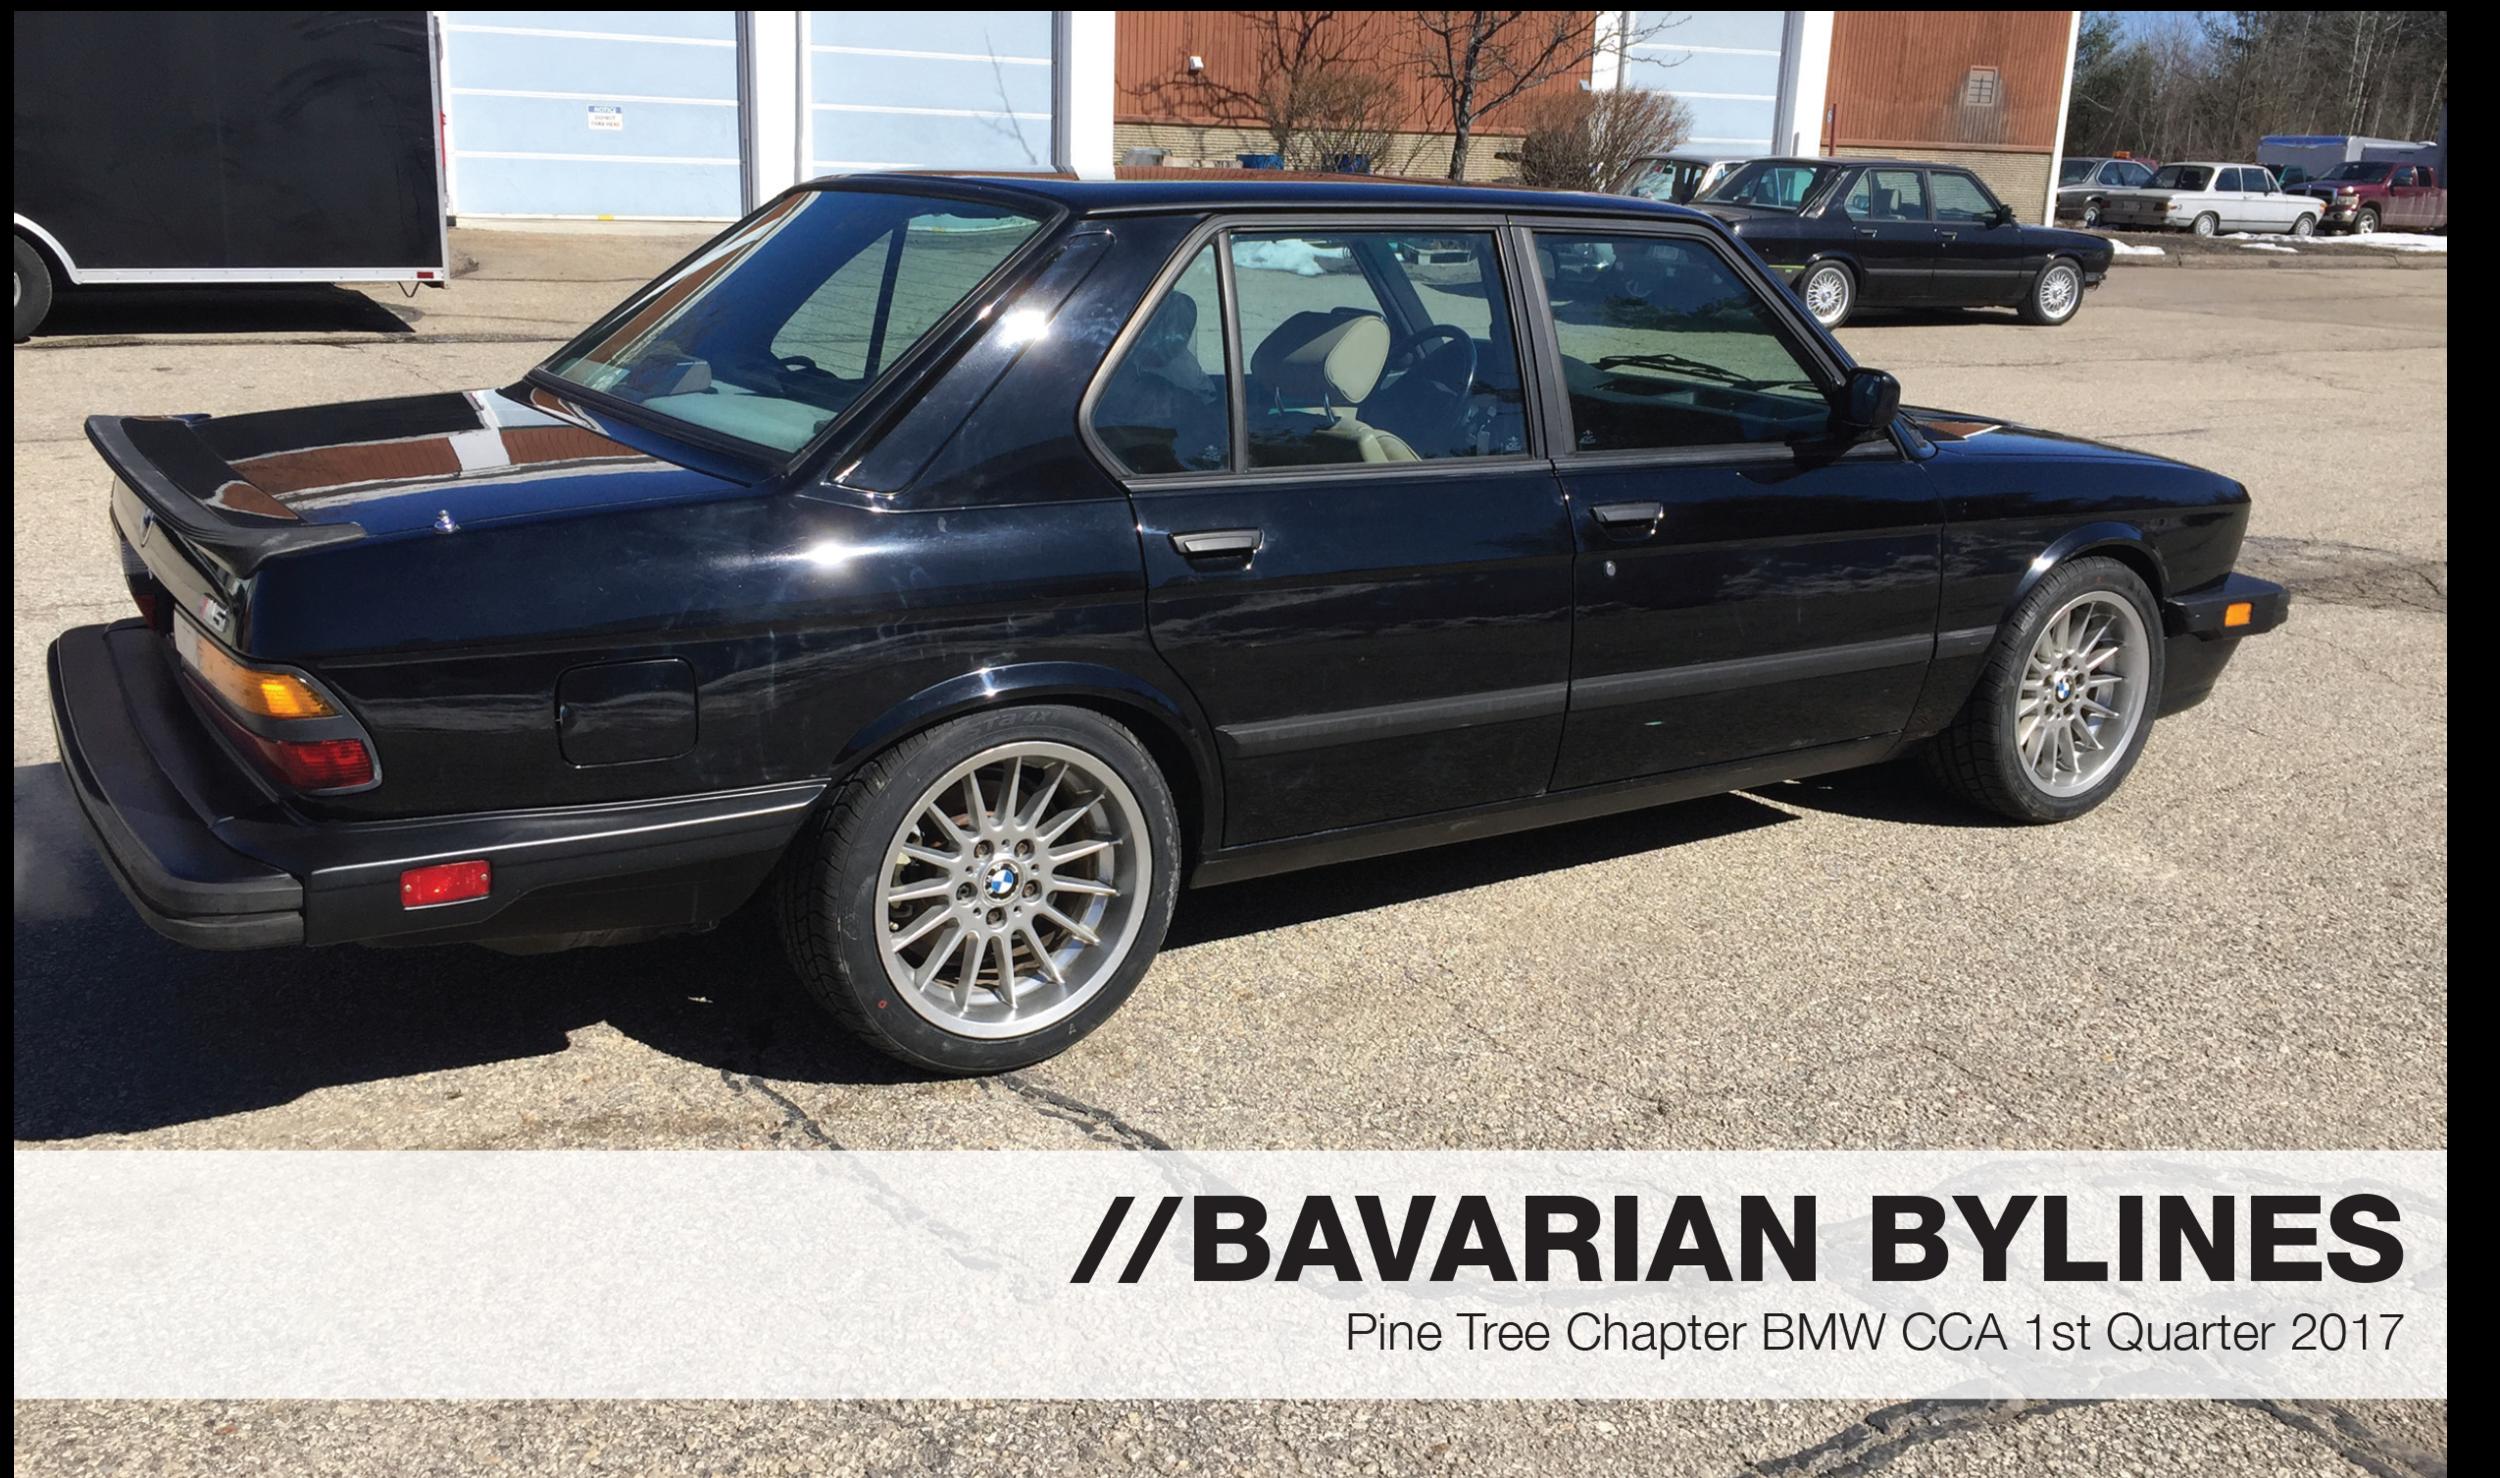 BMWCCA First Quarter 2017-1.png